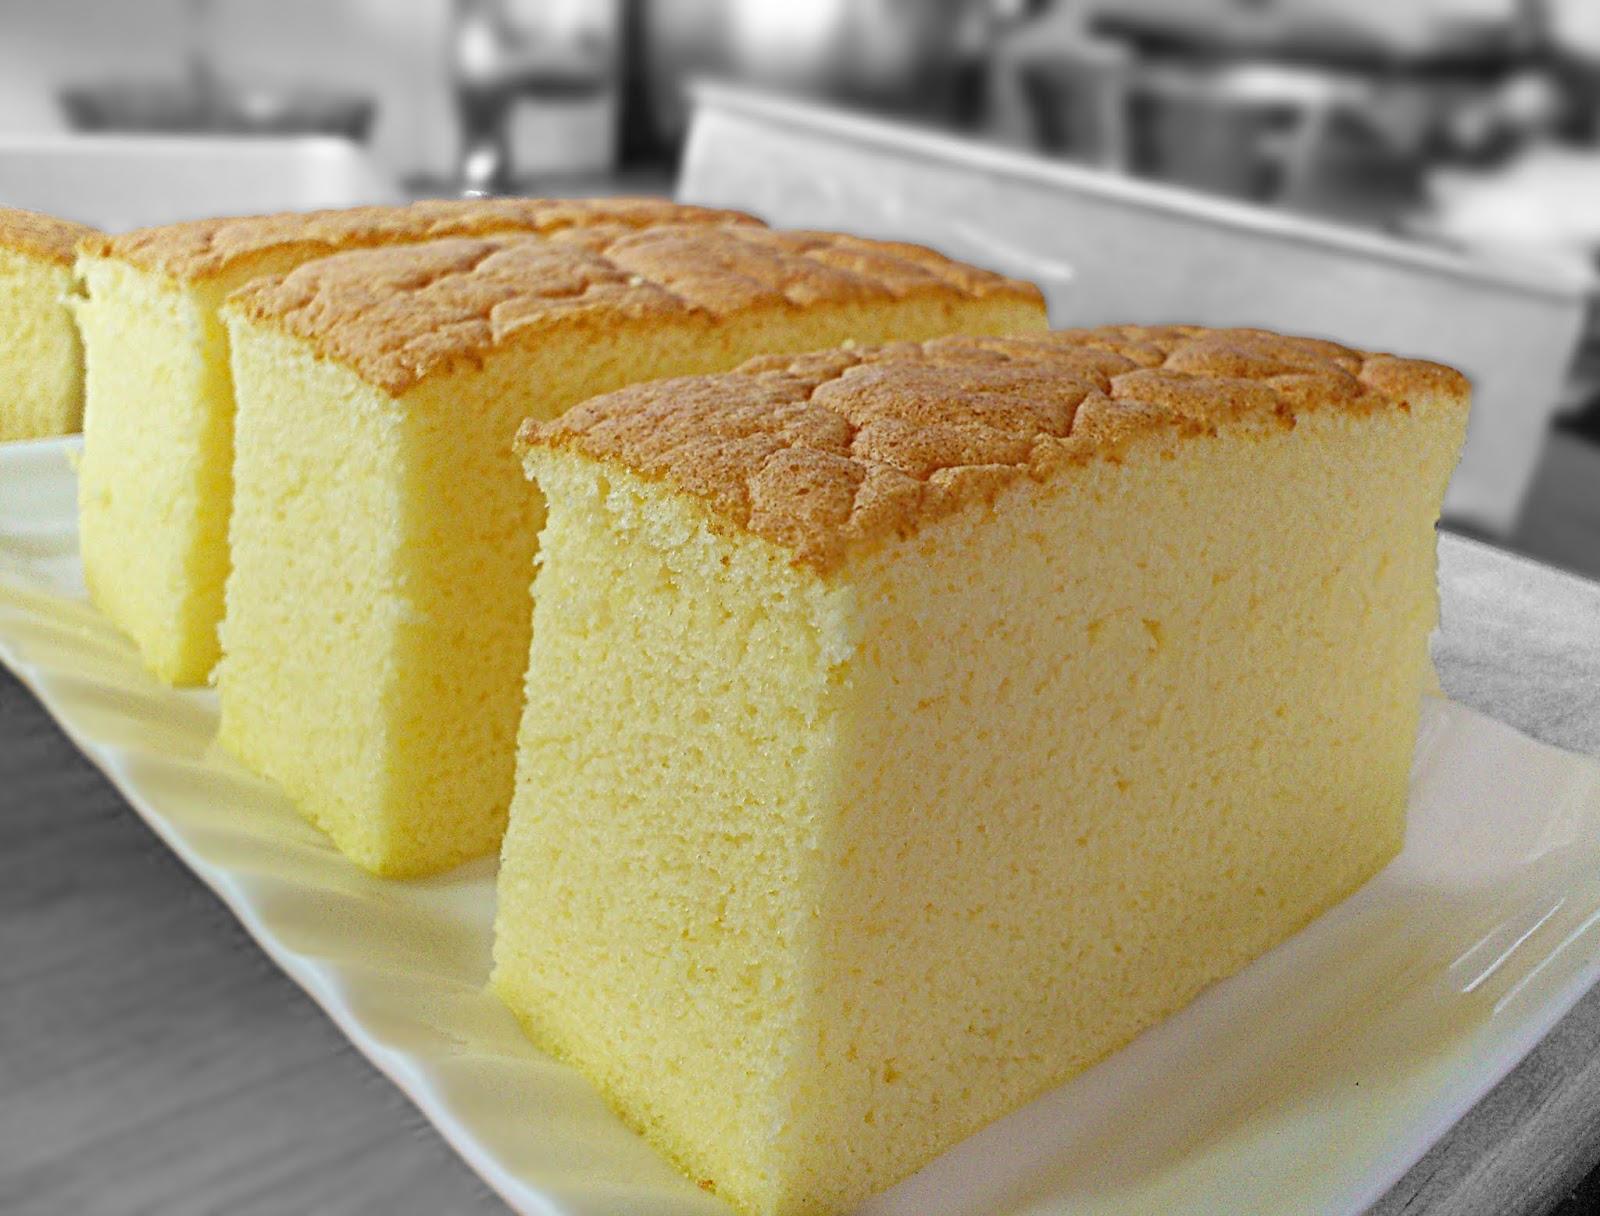 square ogura cake sitting on a cooling rack